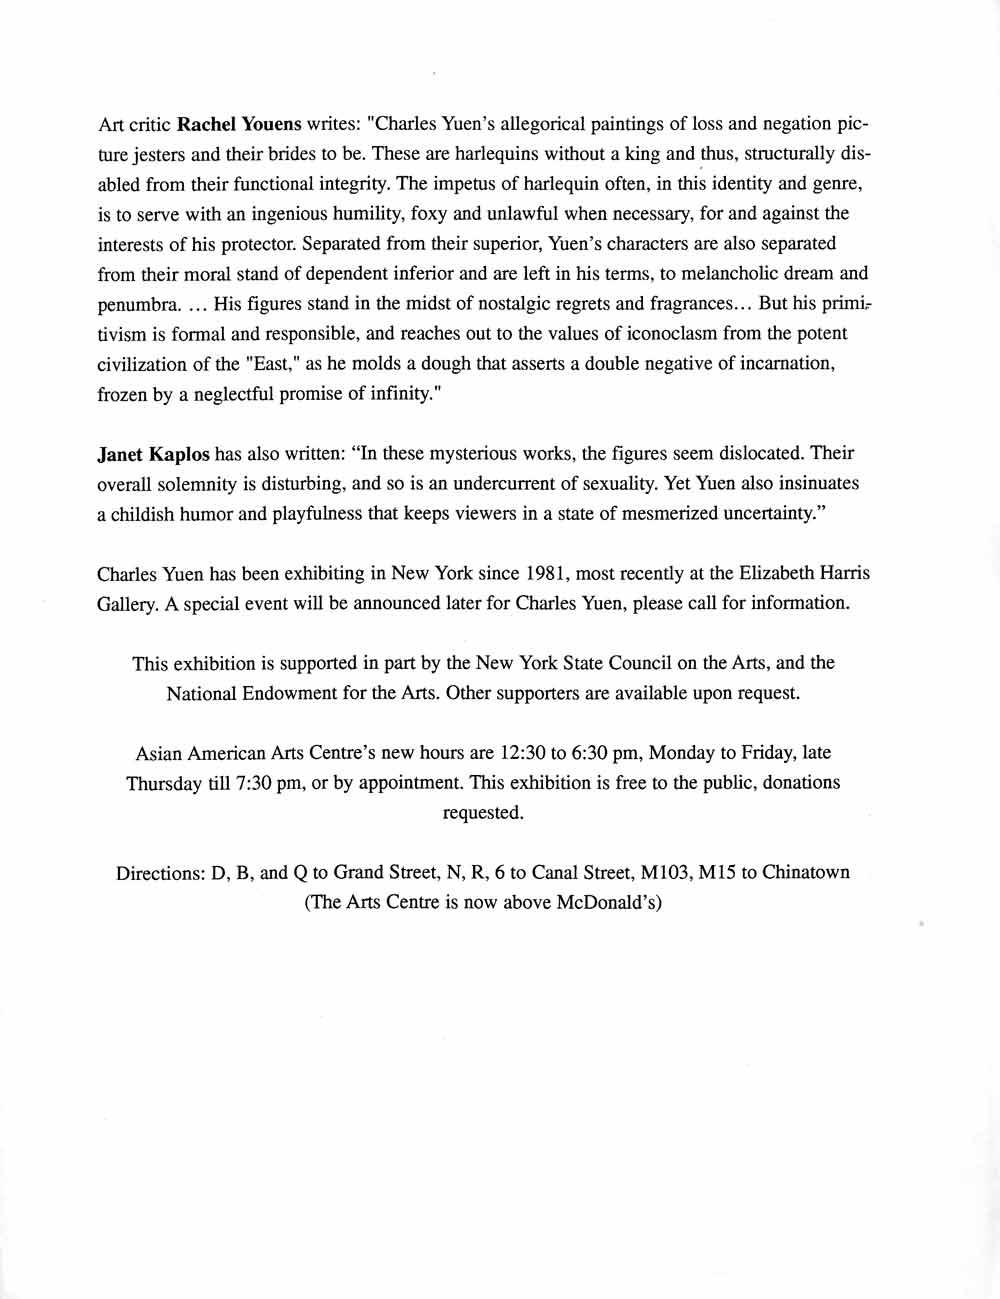 Point Arabesque press release, pg 2